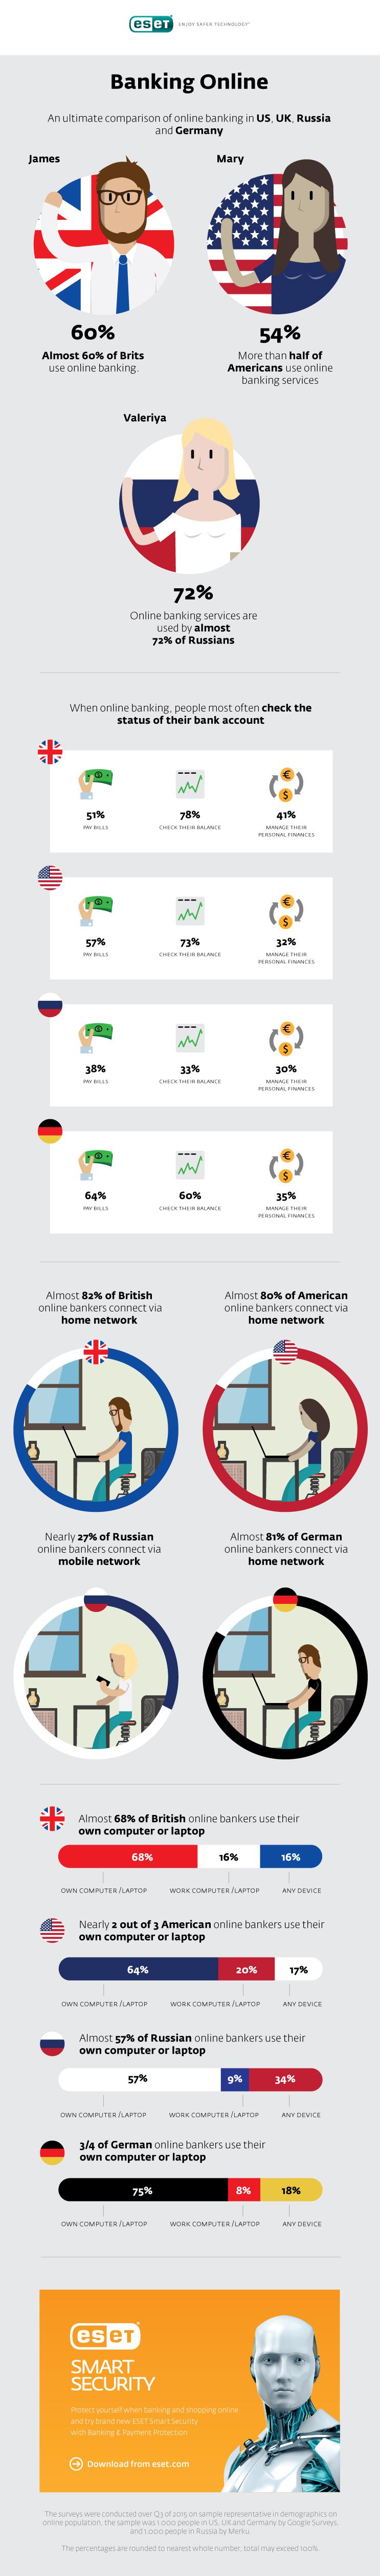 V9_Infographic_Banking_Global